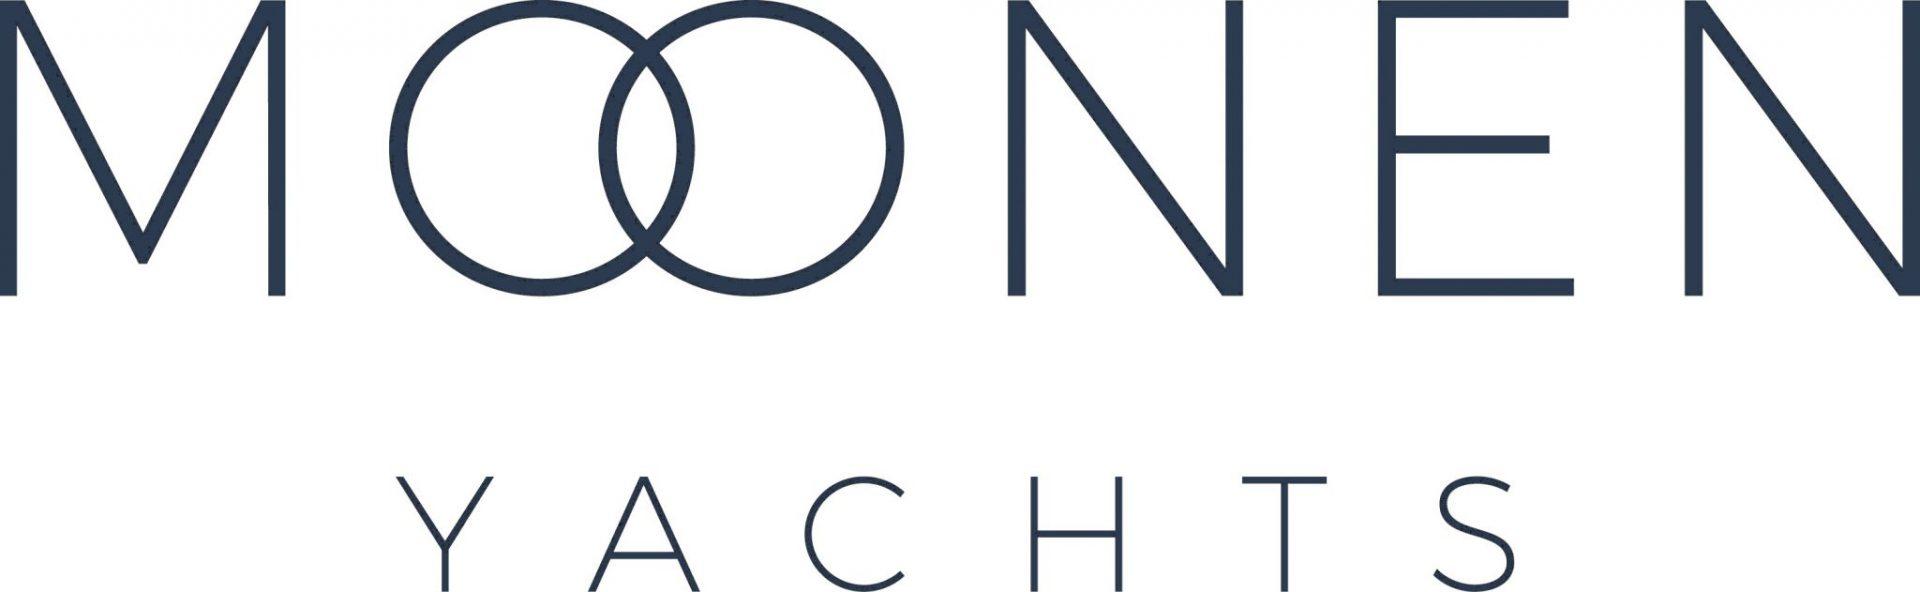 Moonen yachts logo